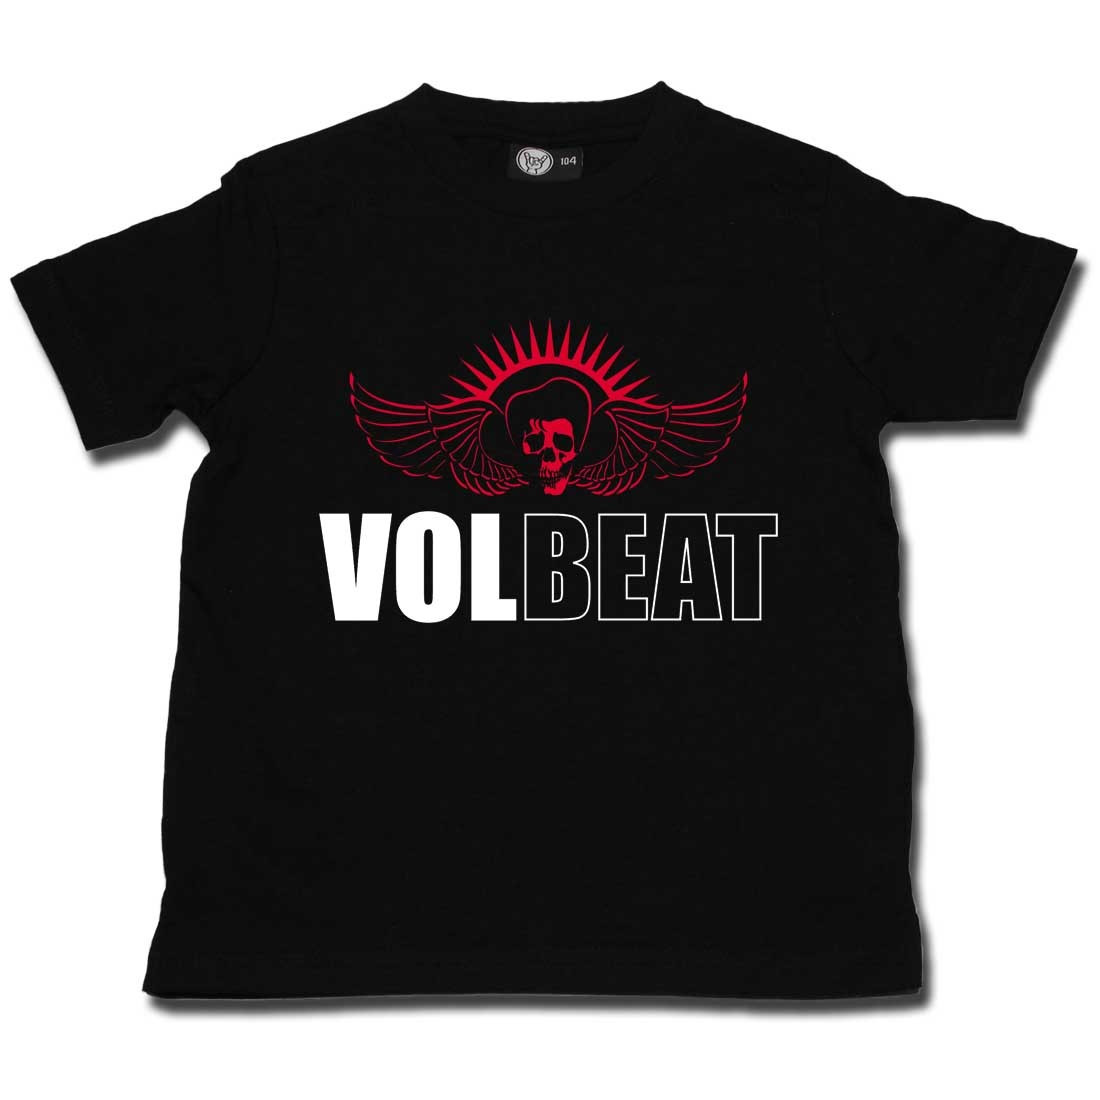 Volbeat Kids T-shirt Skullwing (Clothing)